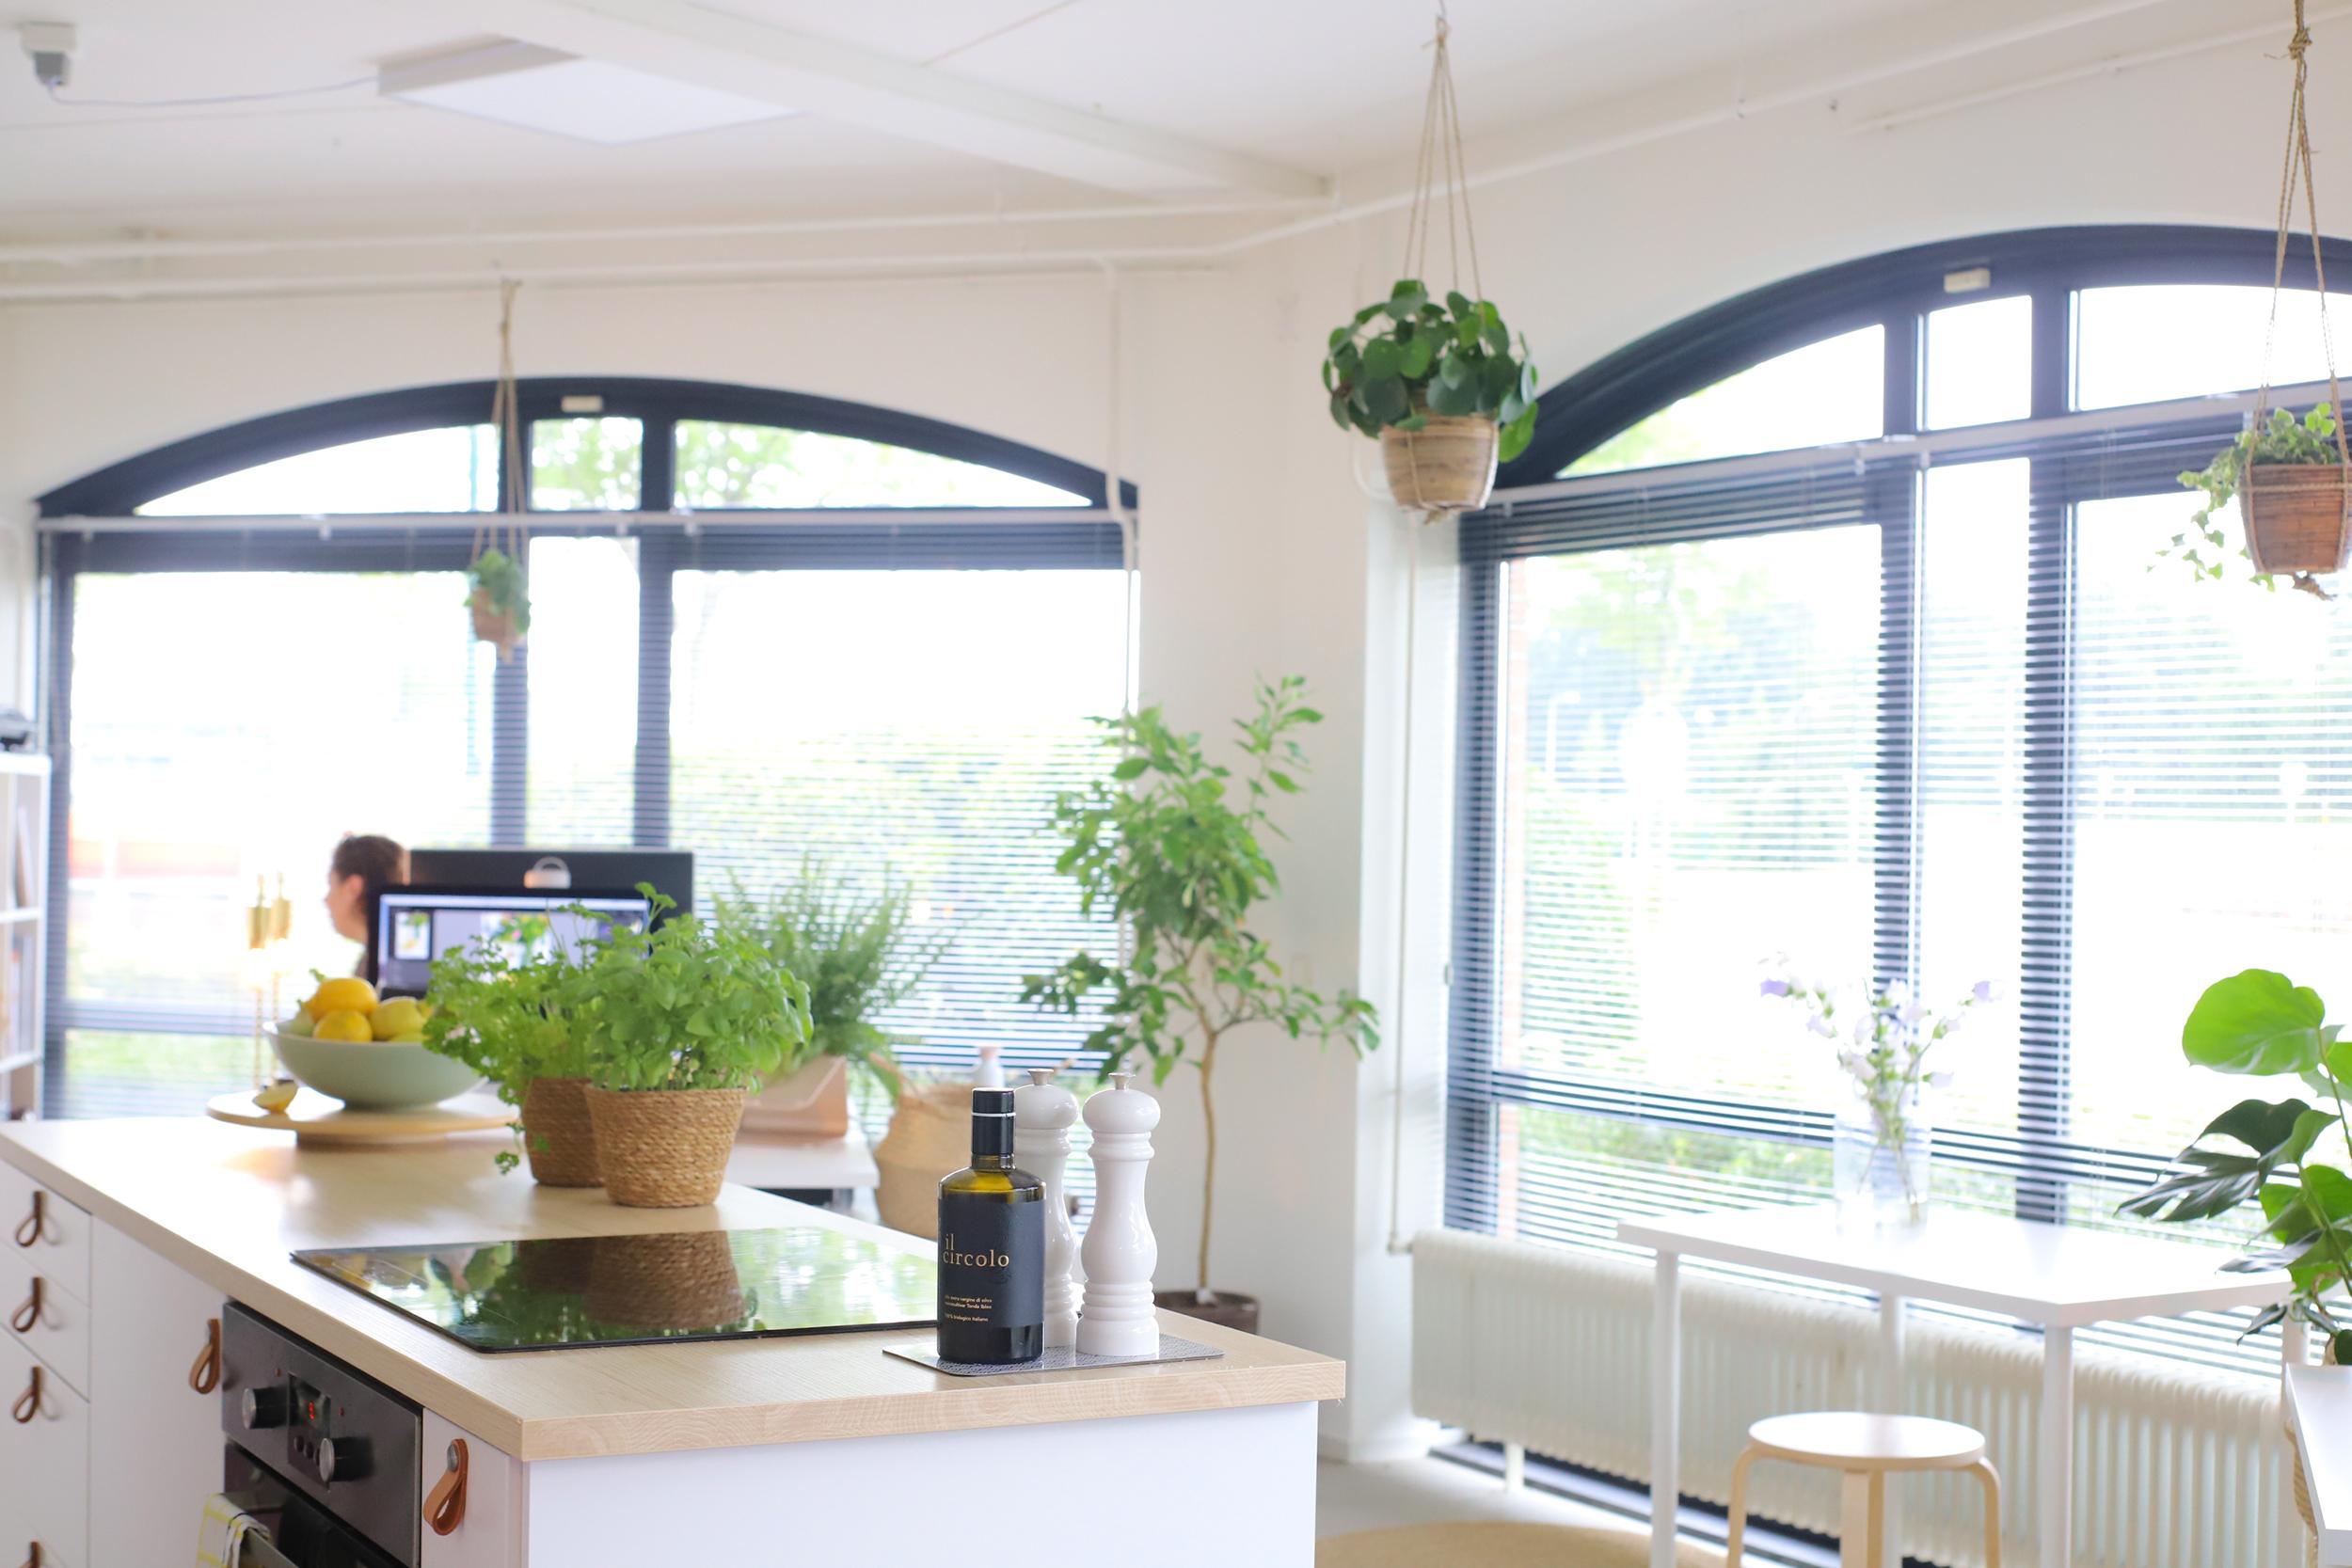 The Lemon Kitchen & Betty's Kitchen's Kantoor 'The Lemon Kitchen